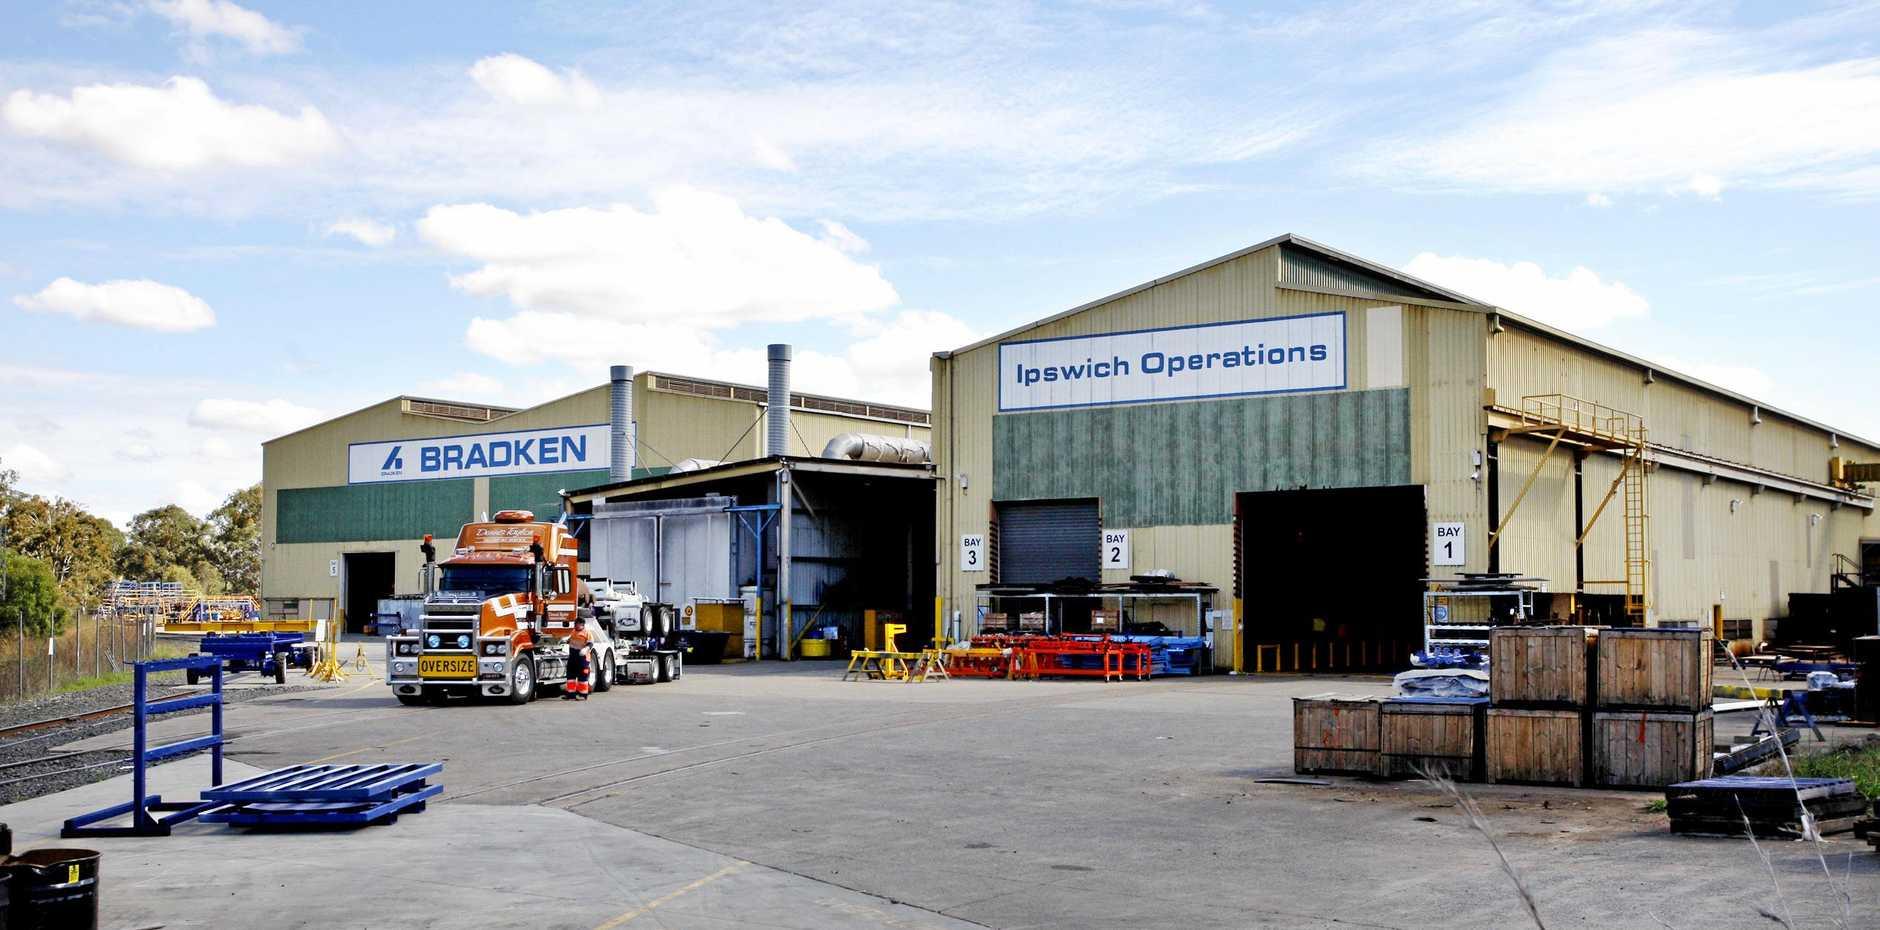 Bradken Ipswich Operations.